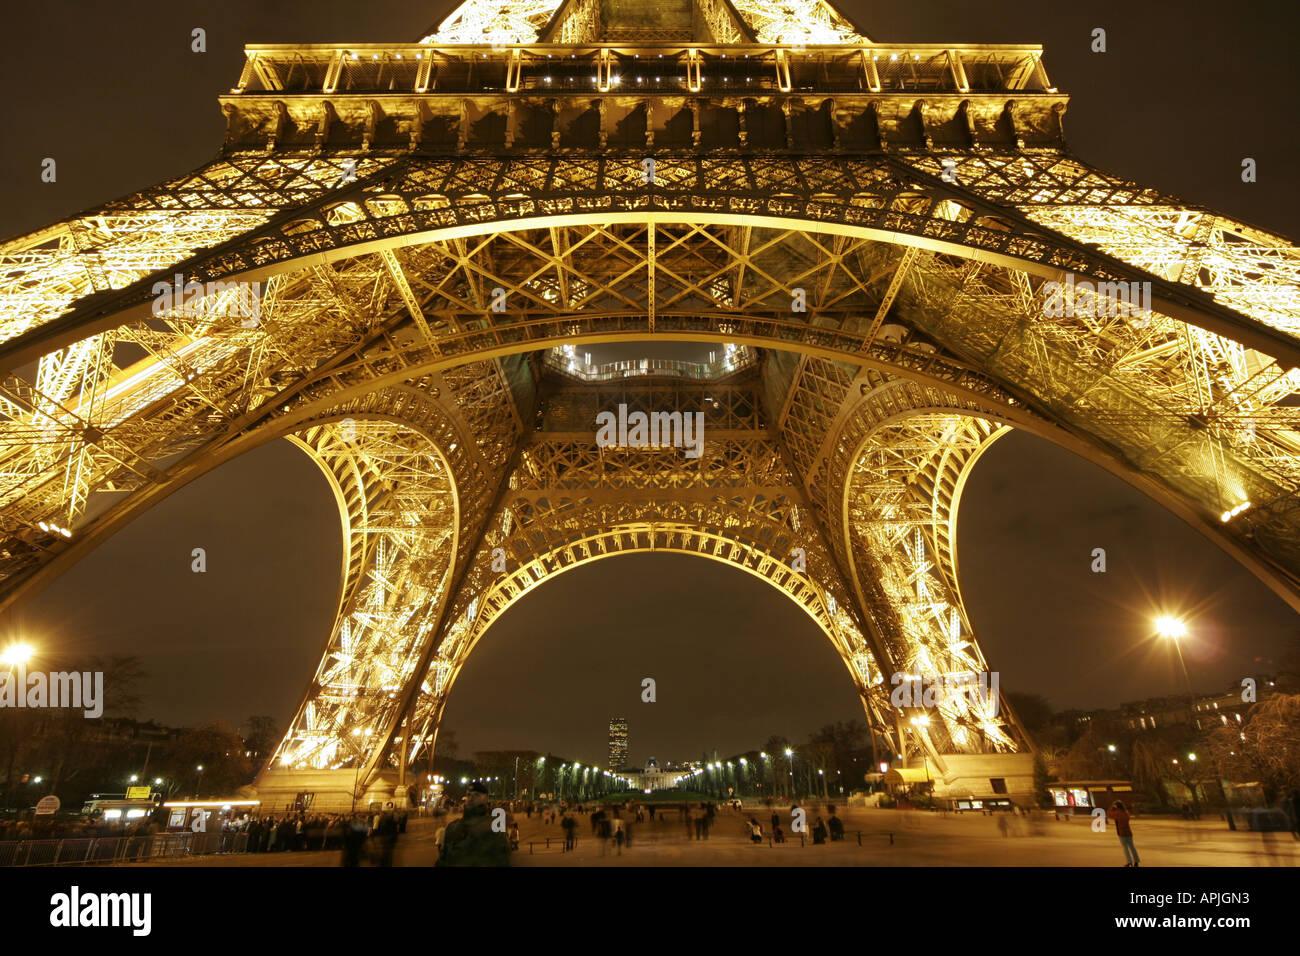 Eiffel Tower Tour Paris Night Lit Up Base Close Up Stock Photo Alamy